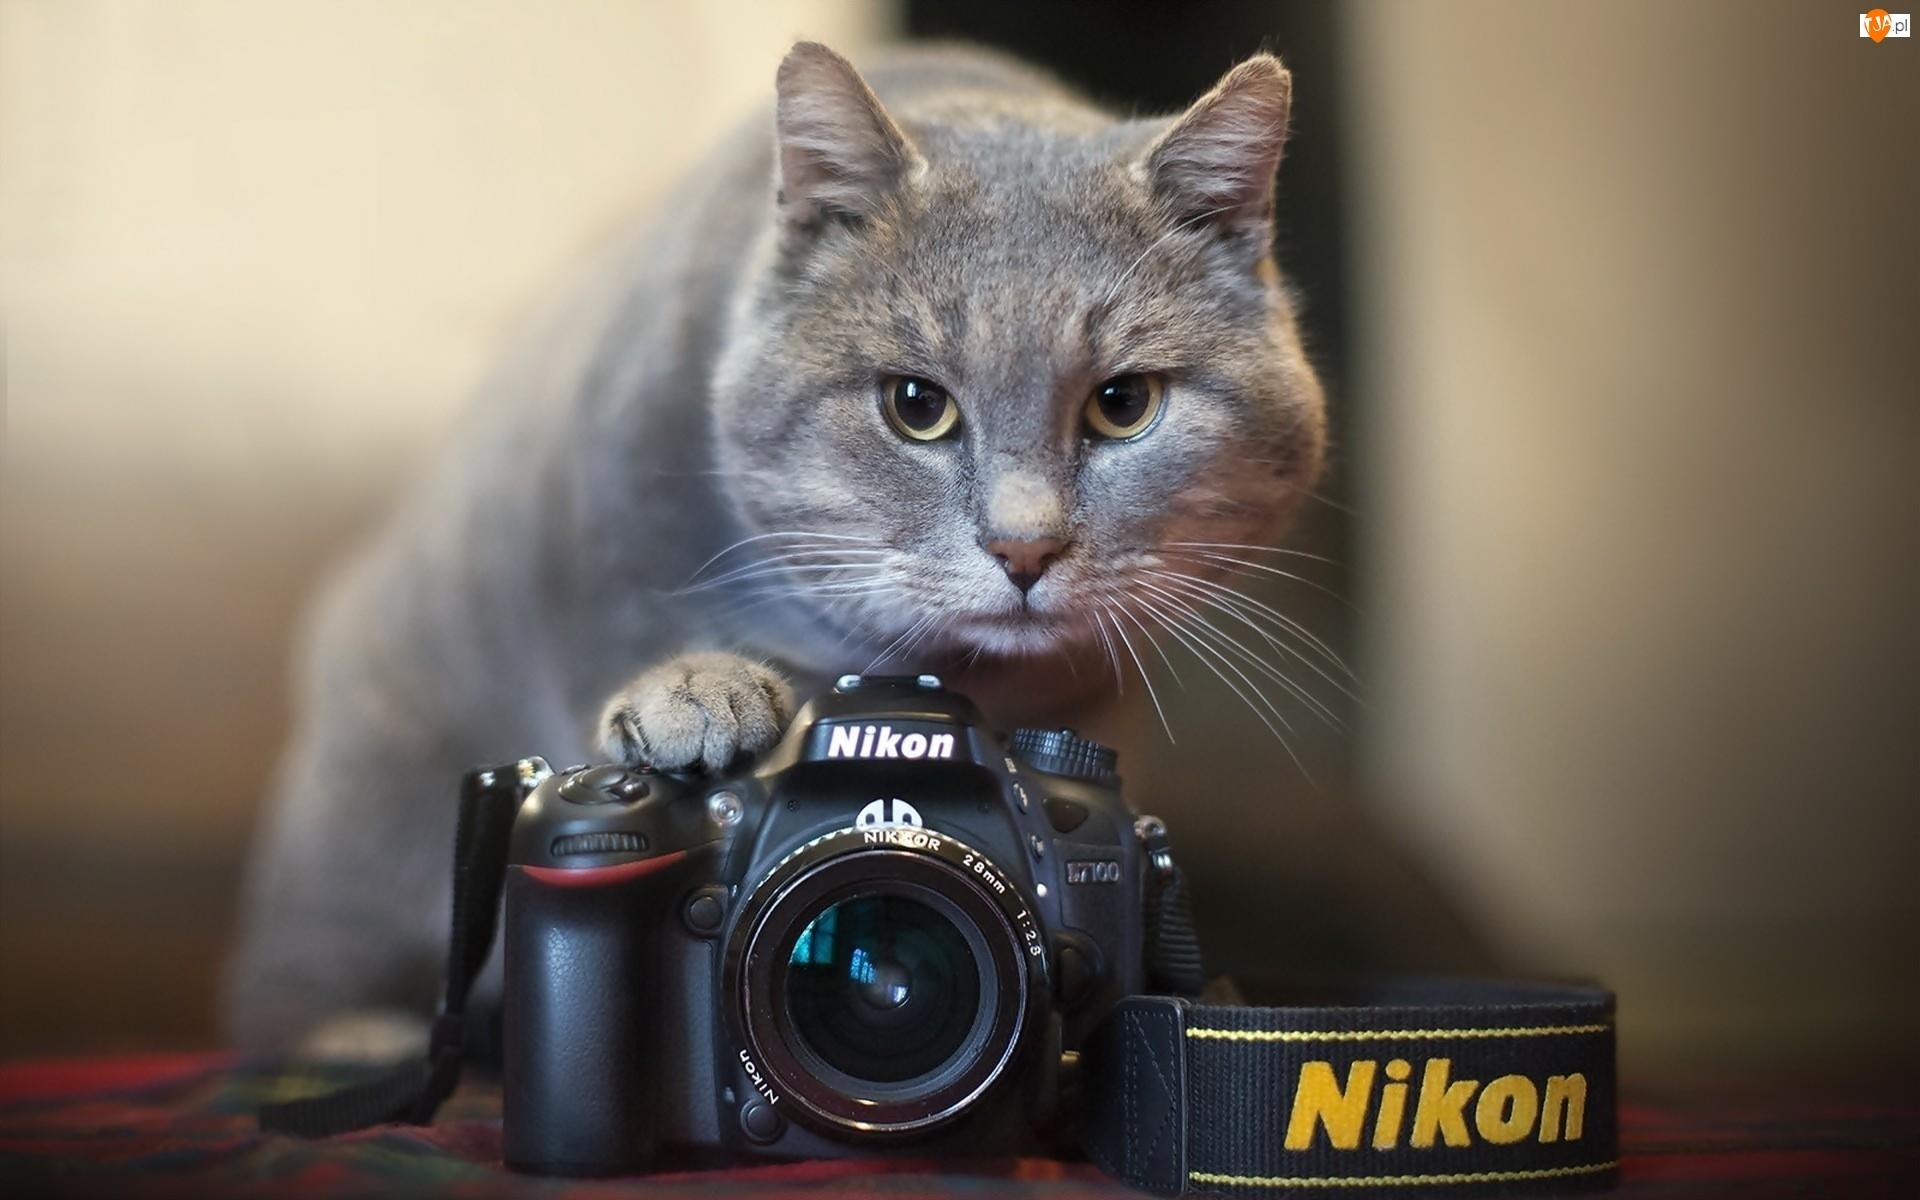 Kot, Nikon, Aparat, Fotograficzny